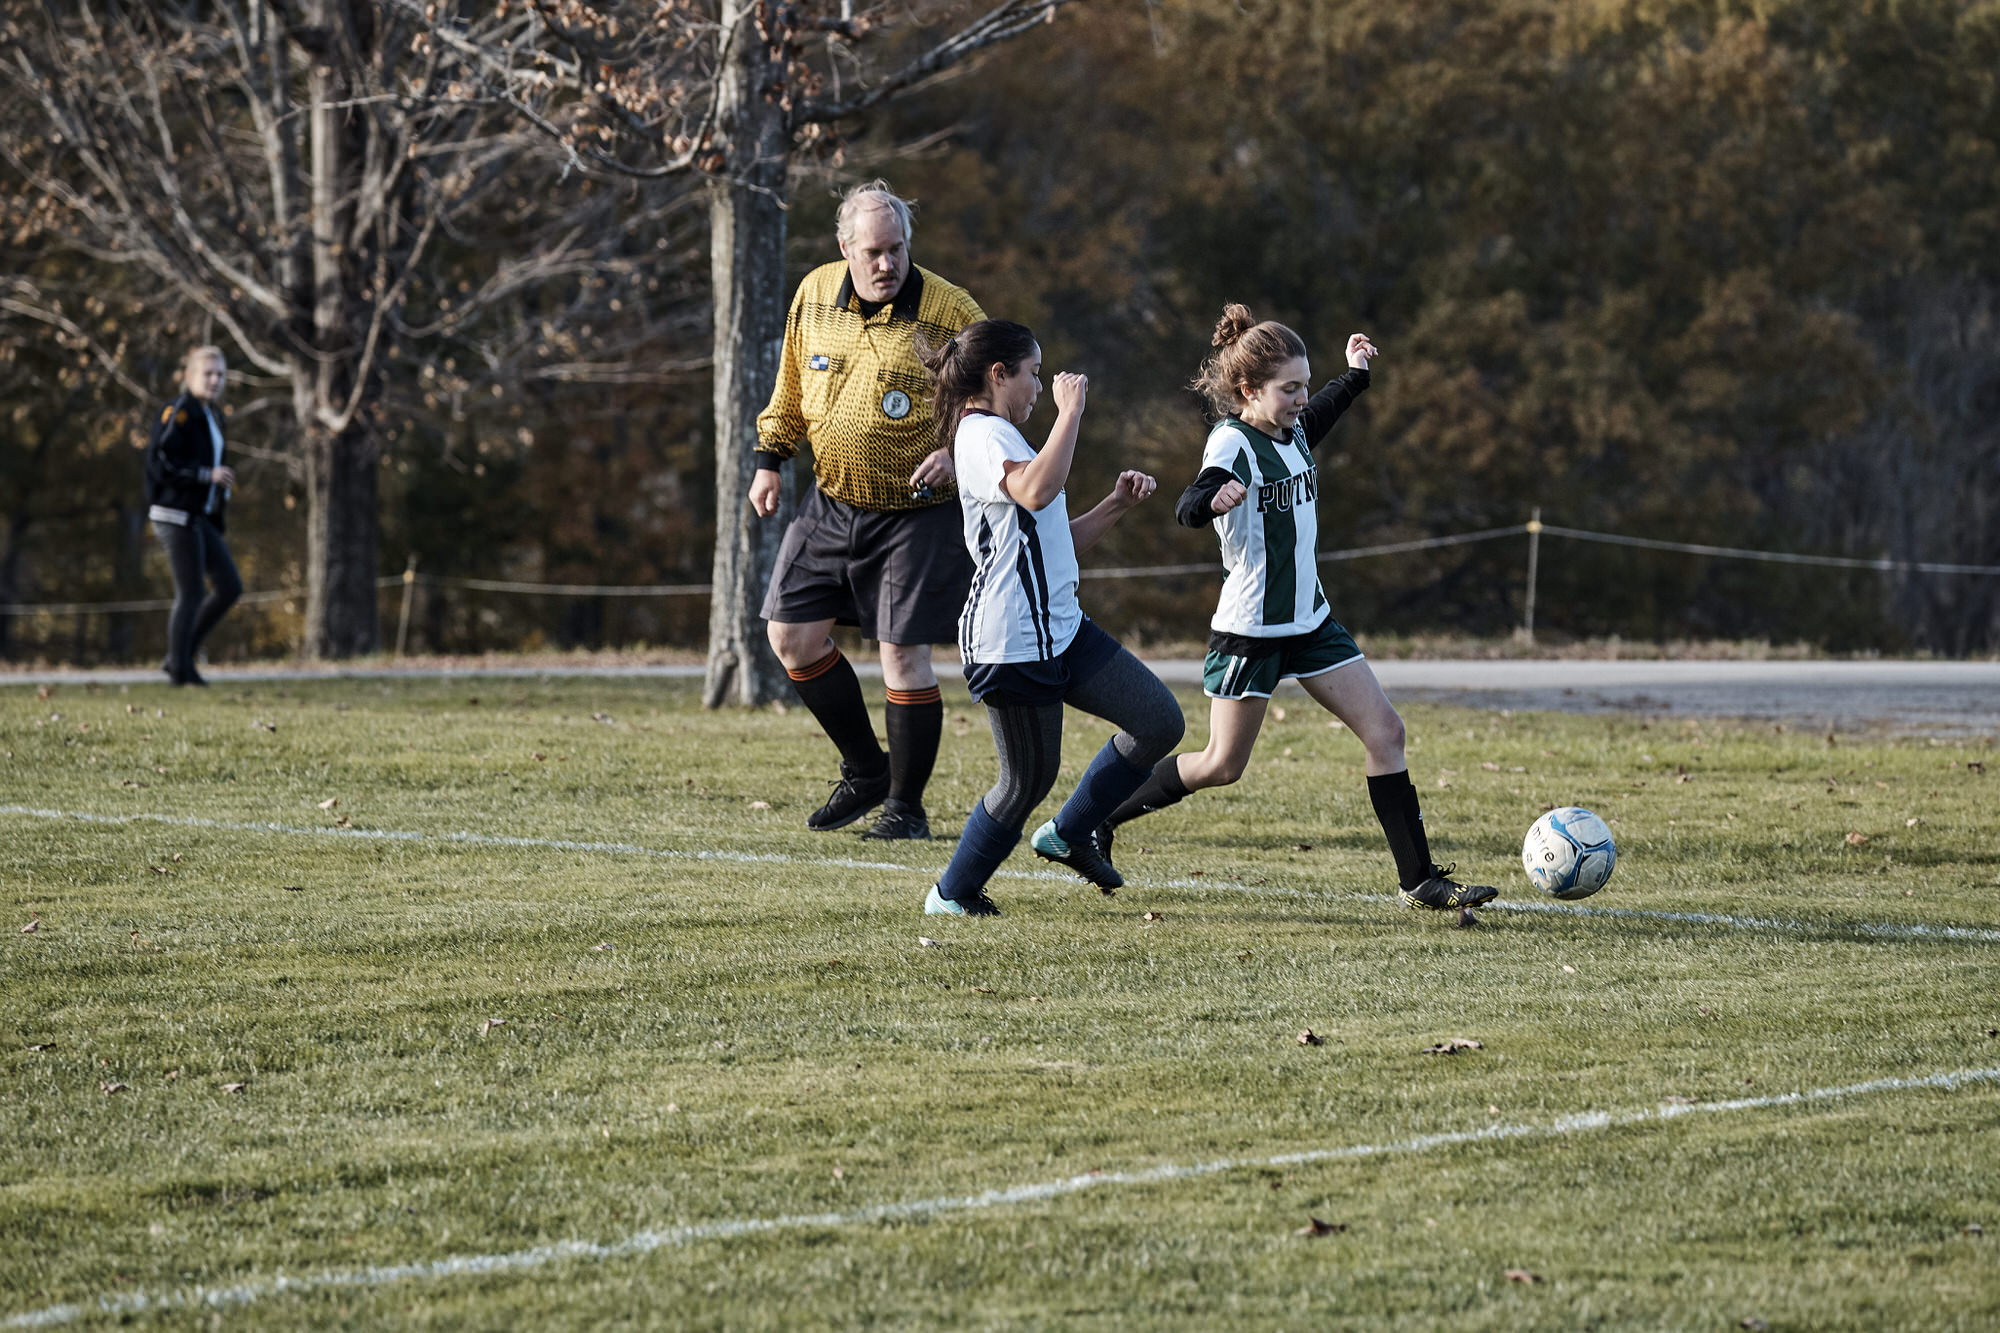 Girls Varsity Soccer vs. Putney School - October 26, 2018 - 036.jpg